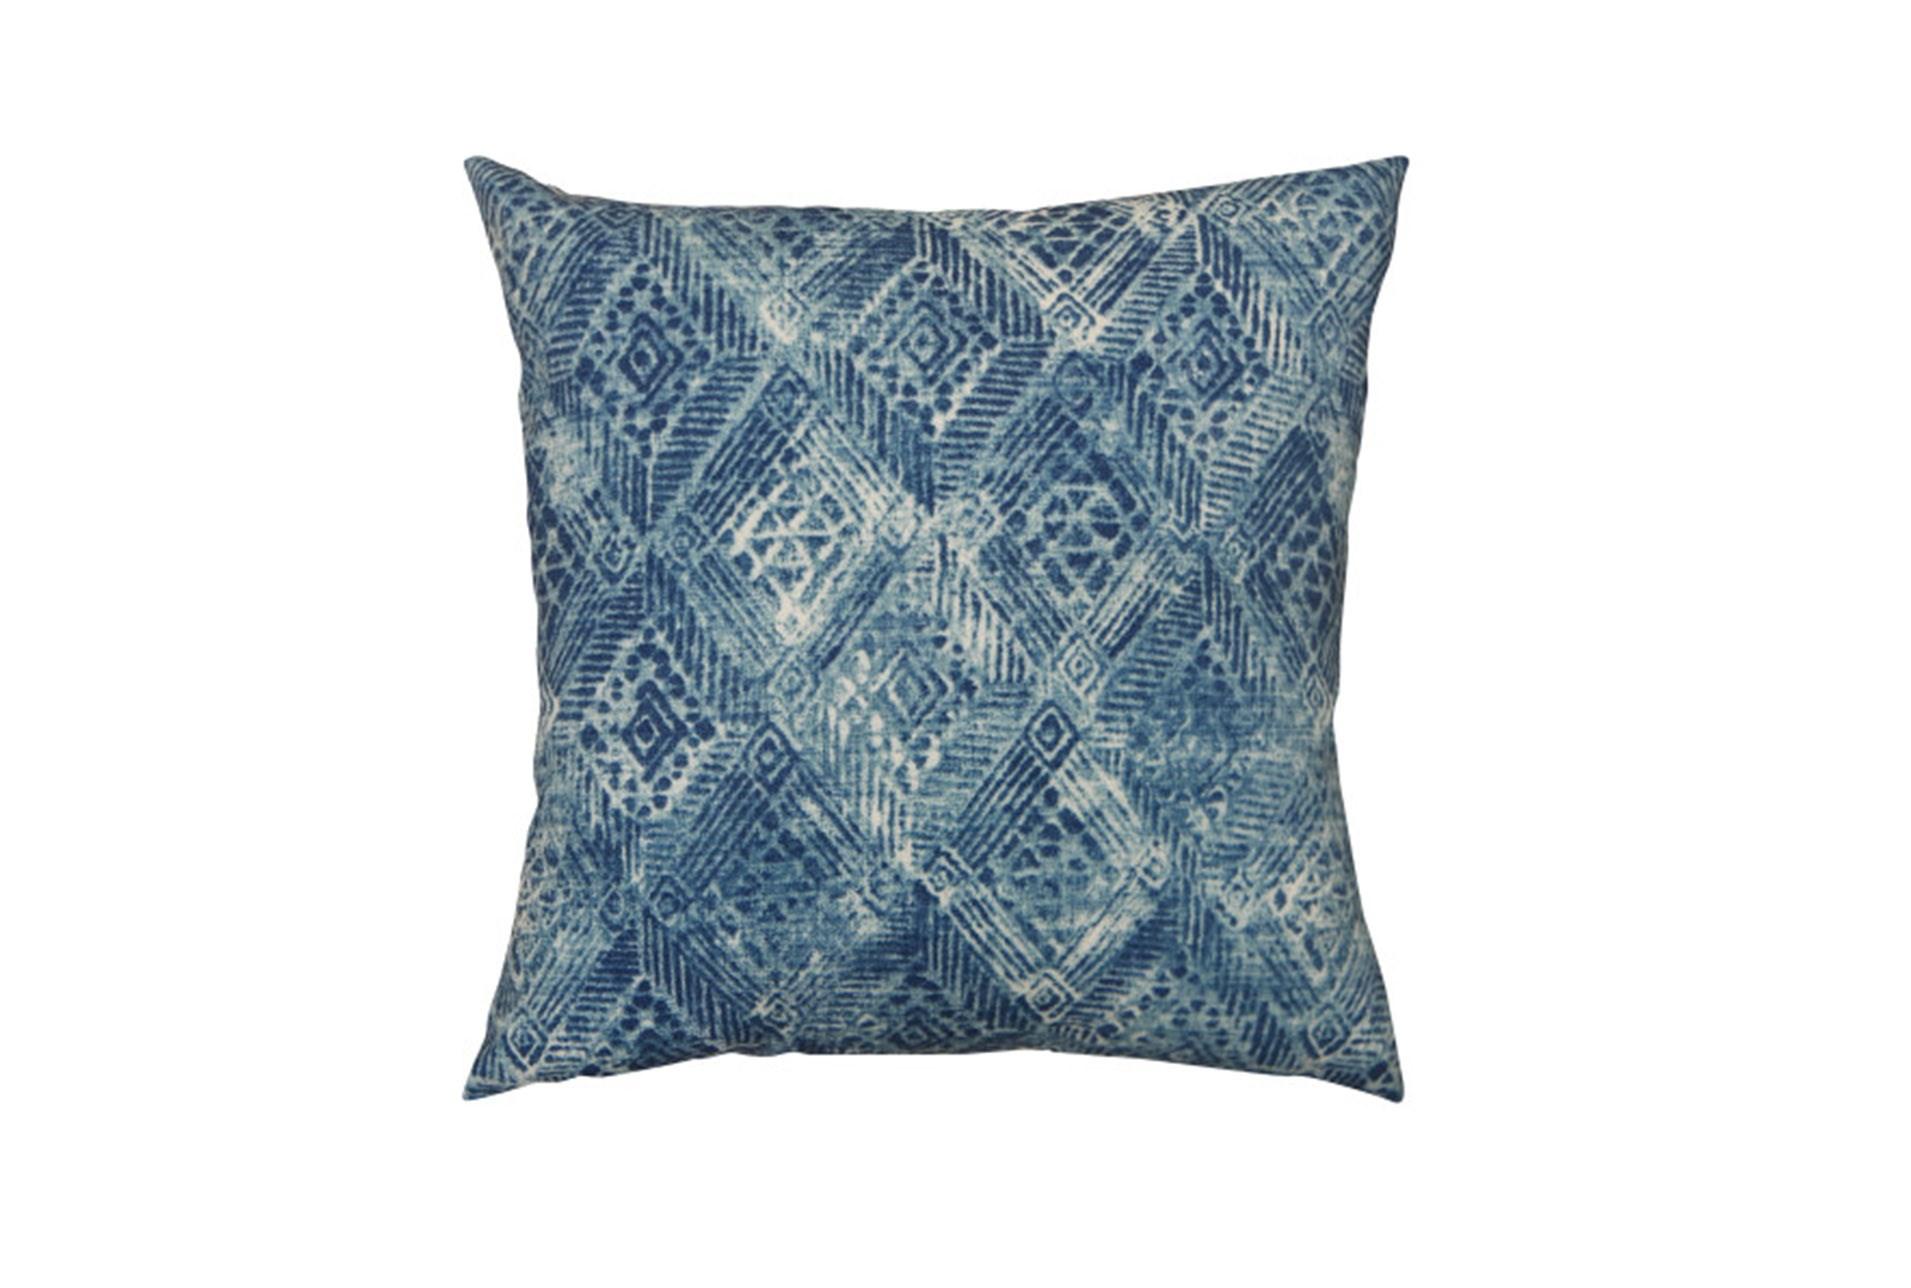 Outdoor Accent Pillow Summer Ikat Indigo 18x18 Living Spaces